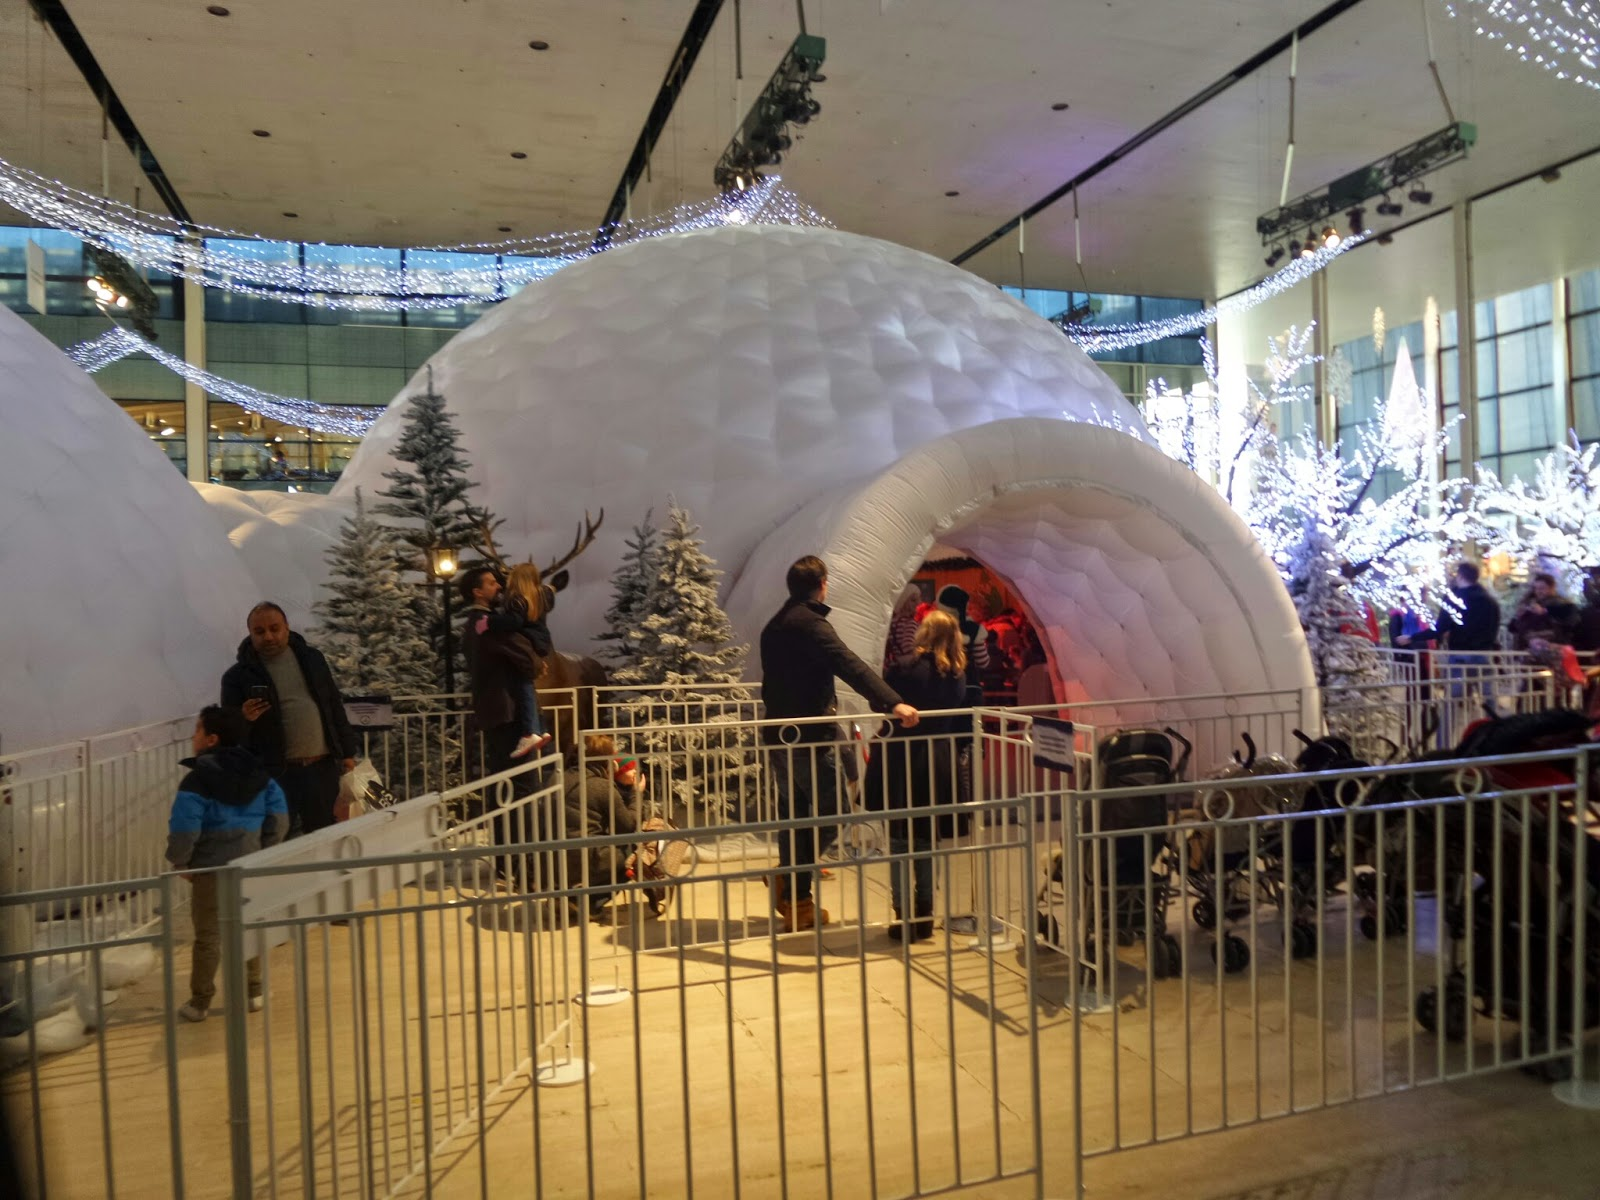 The Igloo at Milton Keynes, where you get to see Santa